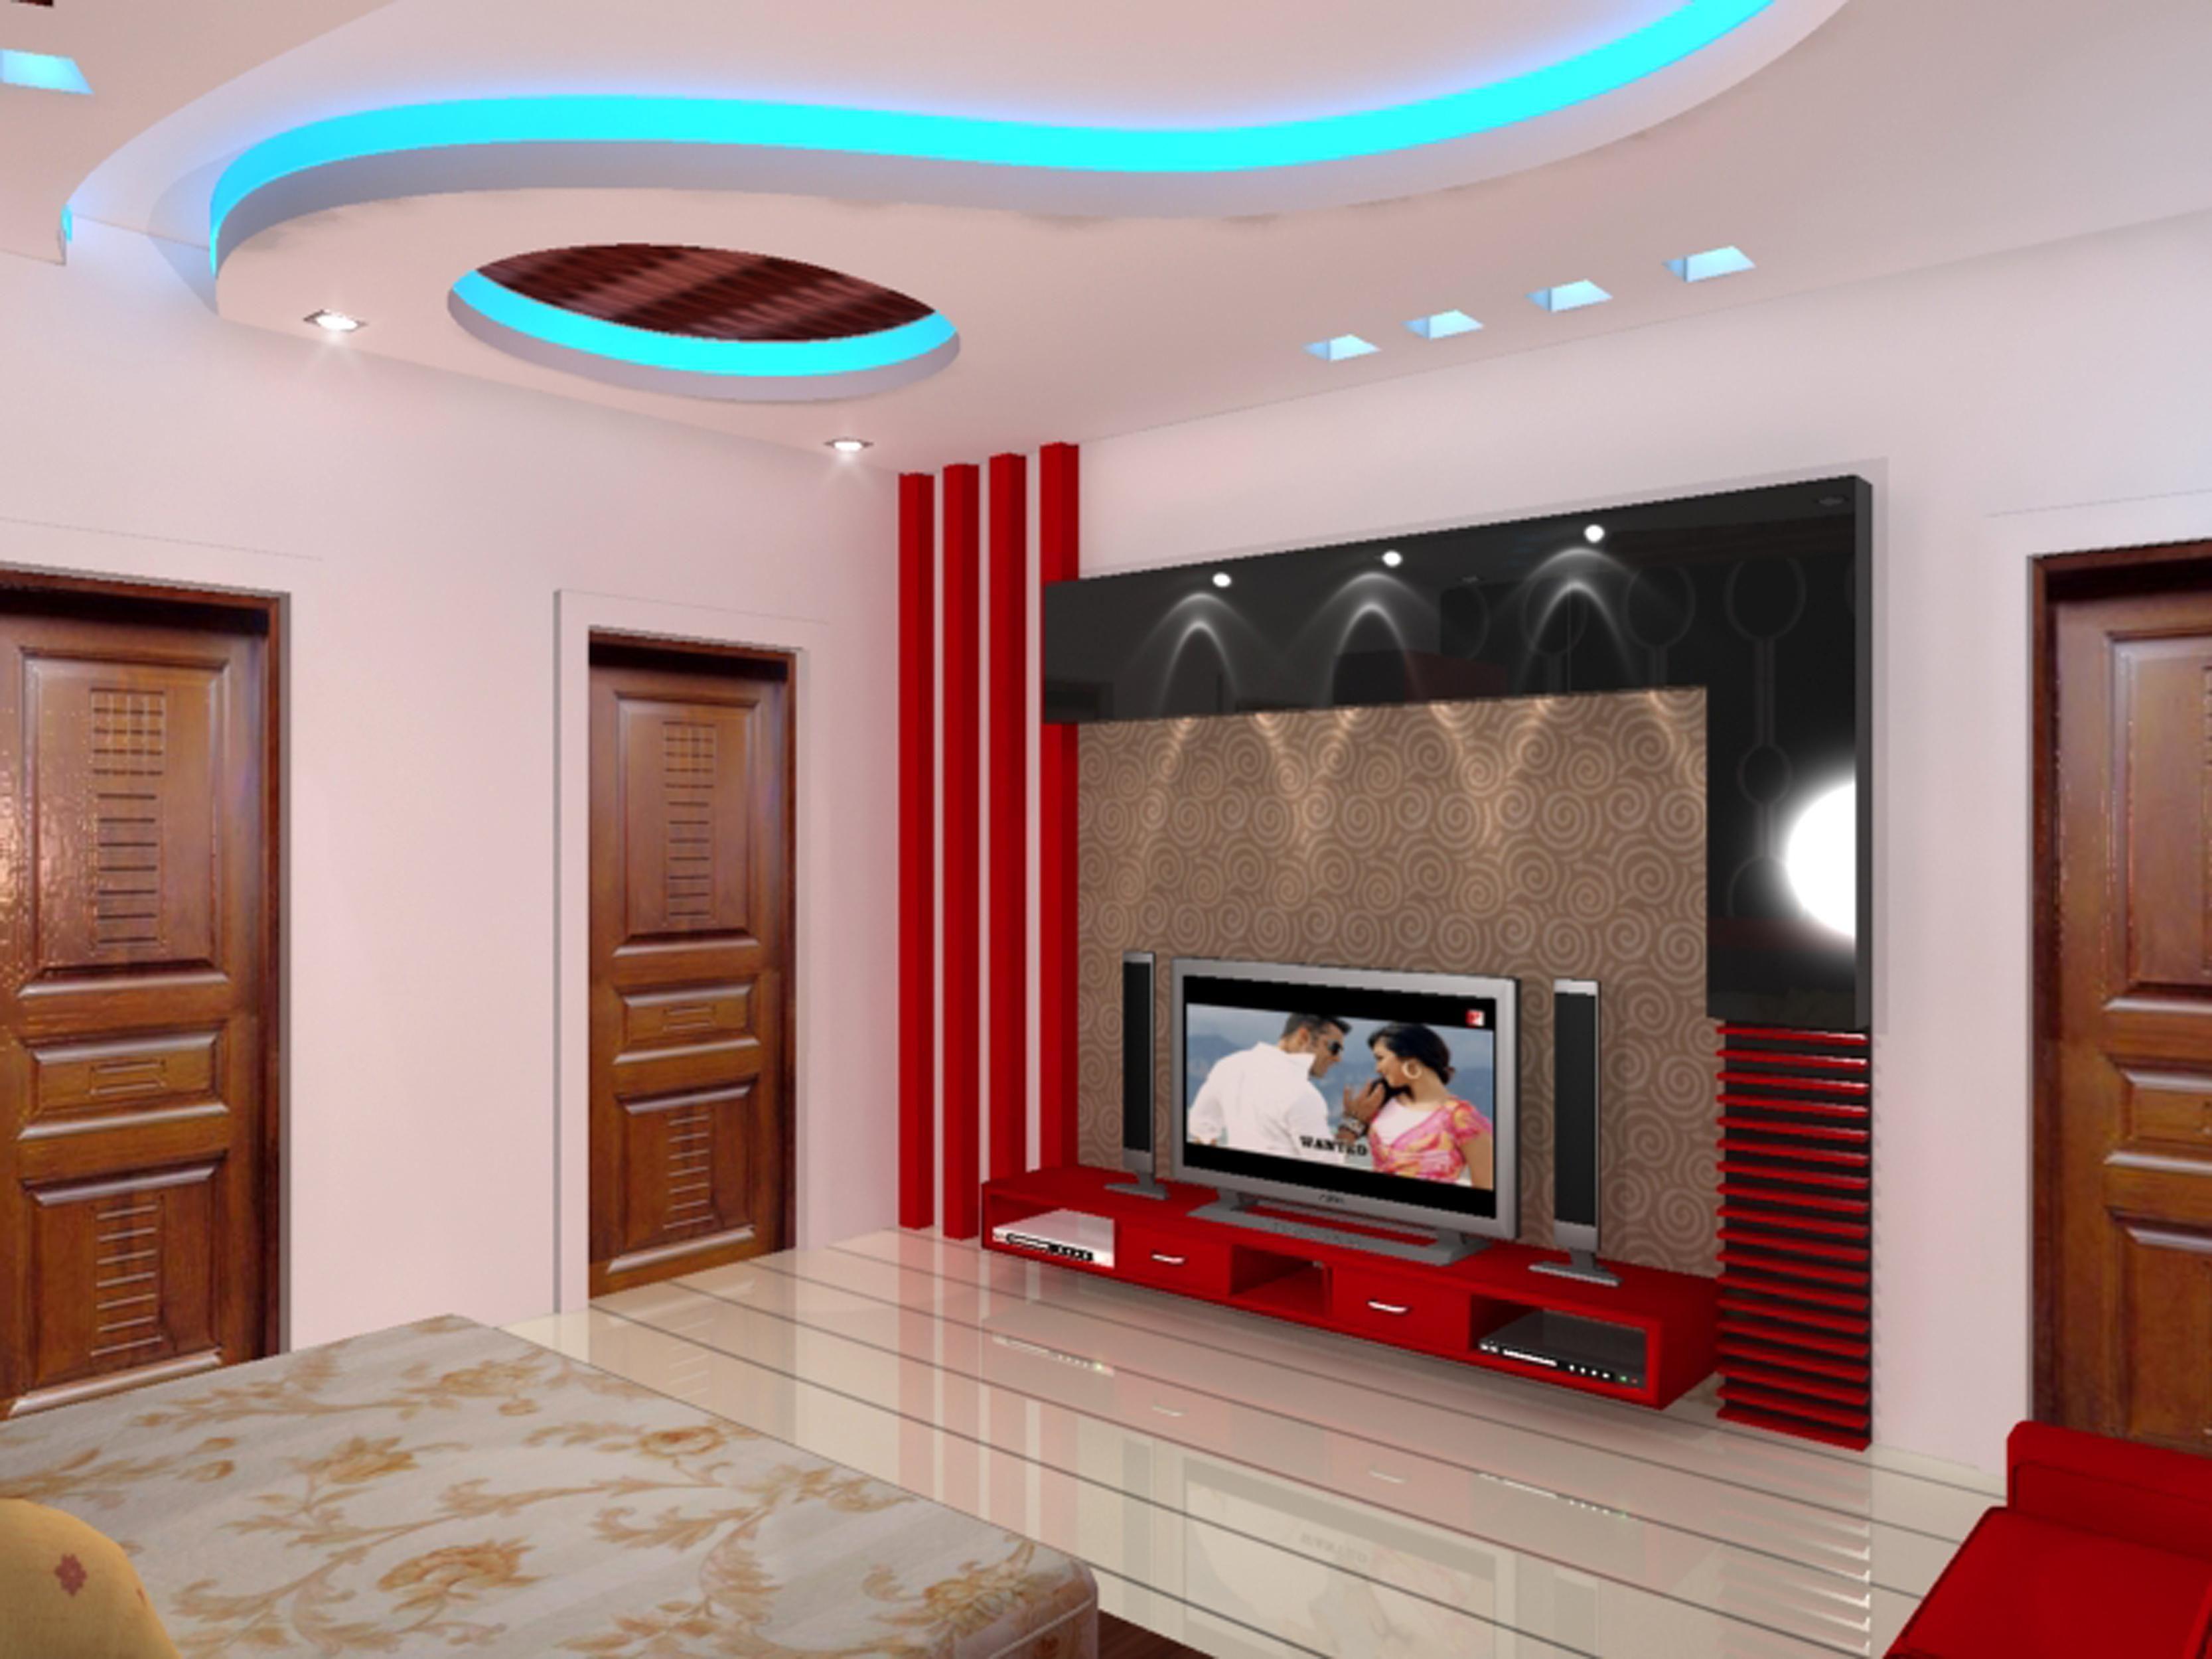 Blue Lights Pop Ceiling Decorating For Master Bedroom With Flat Tv